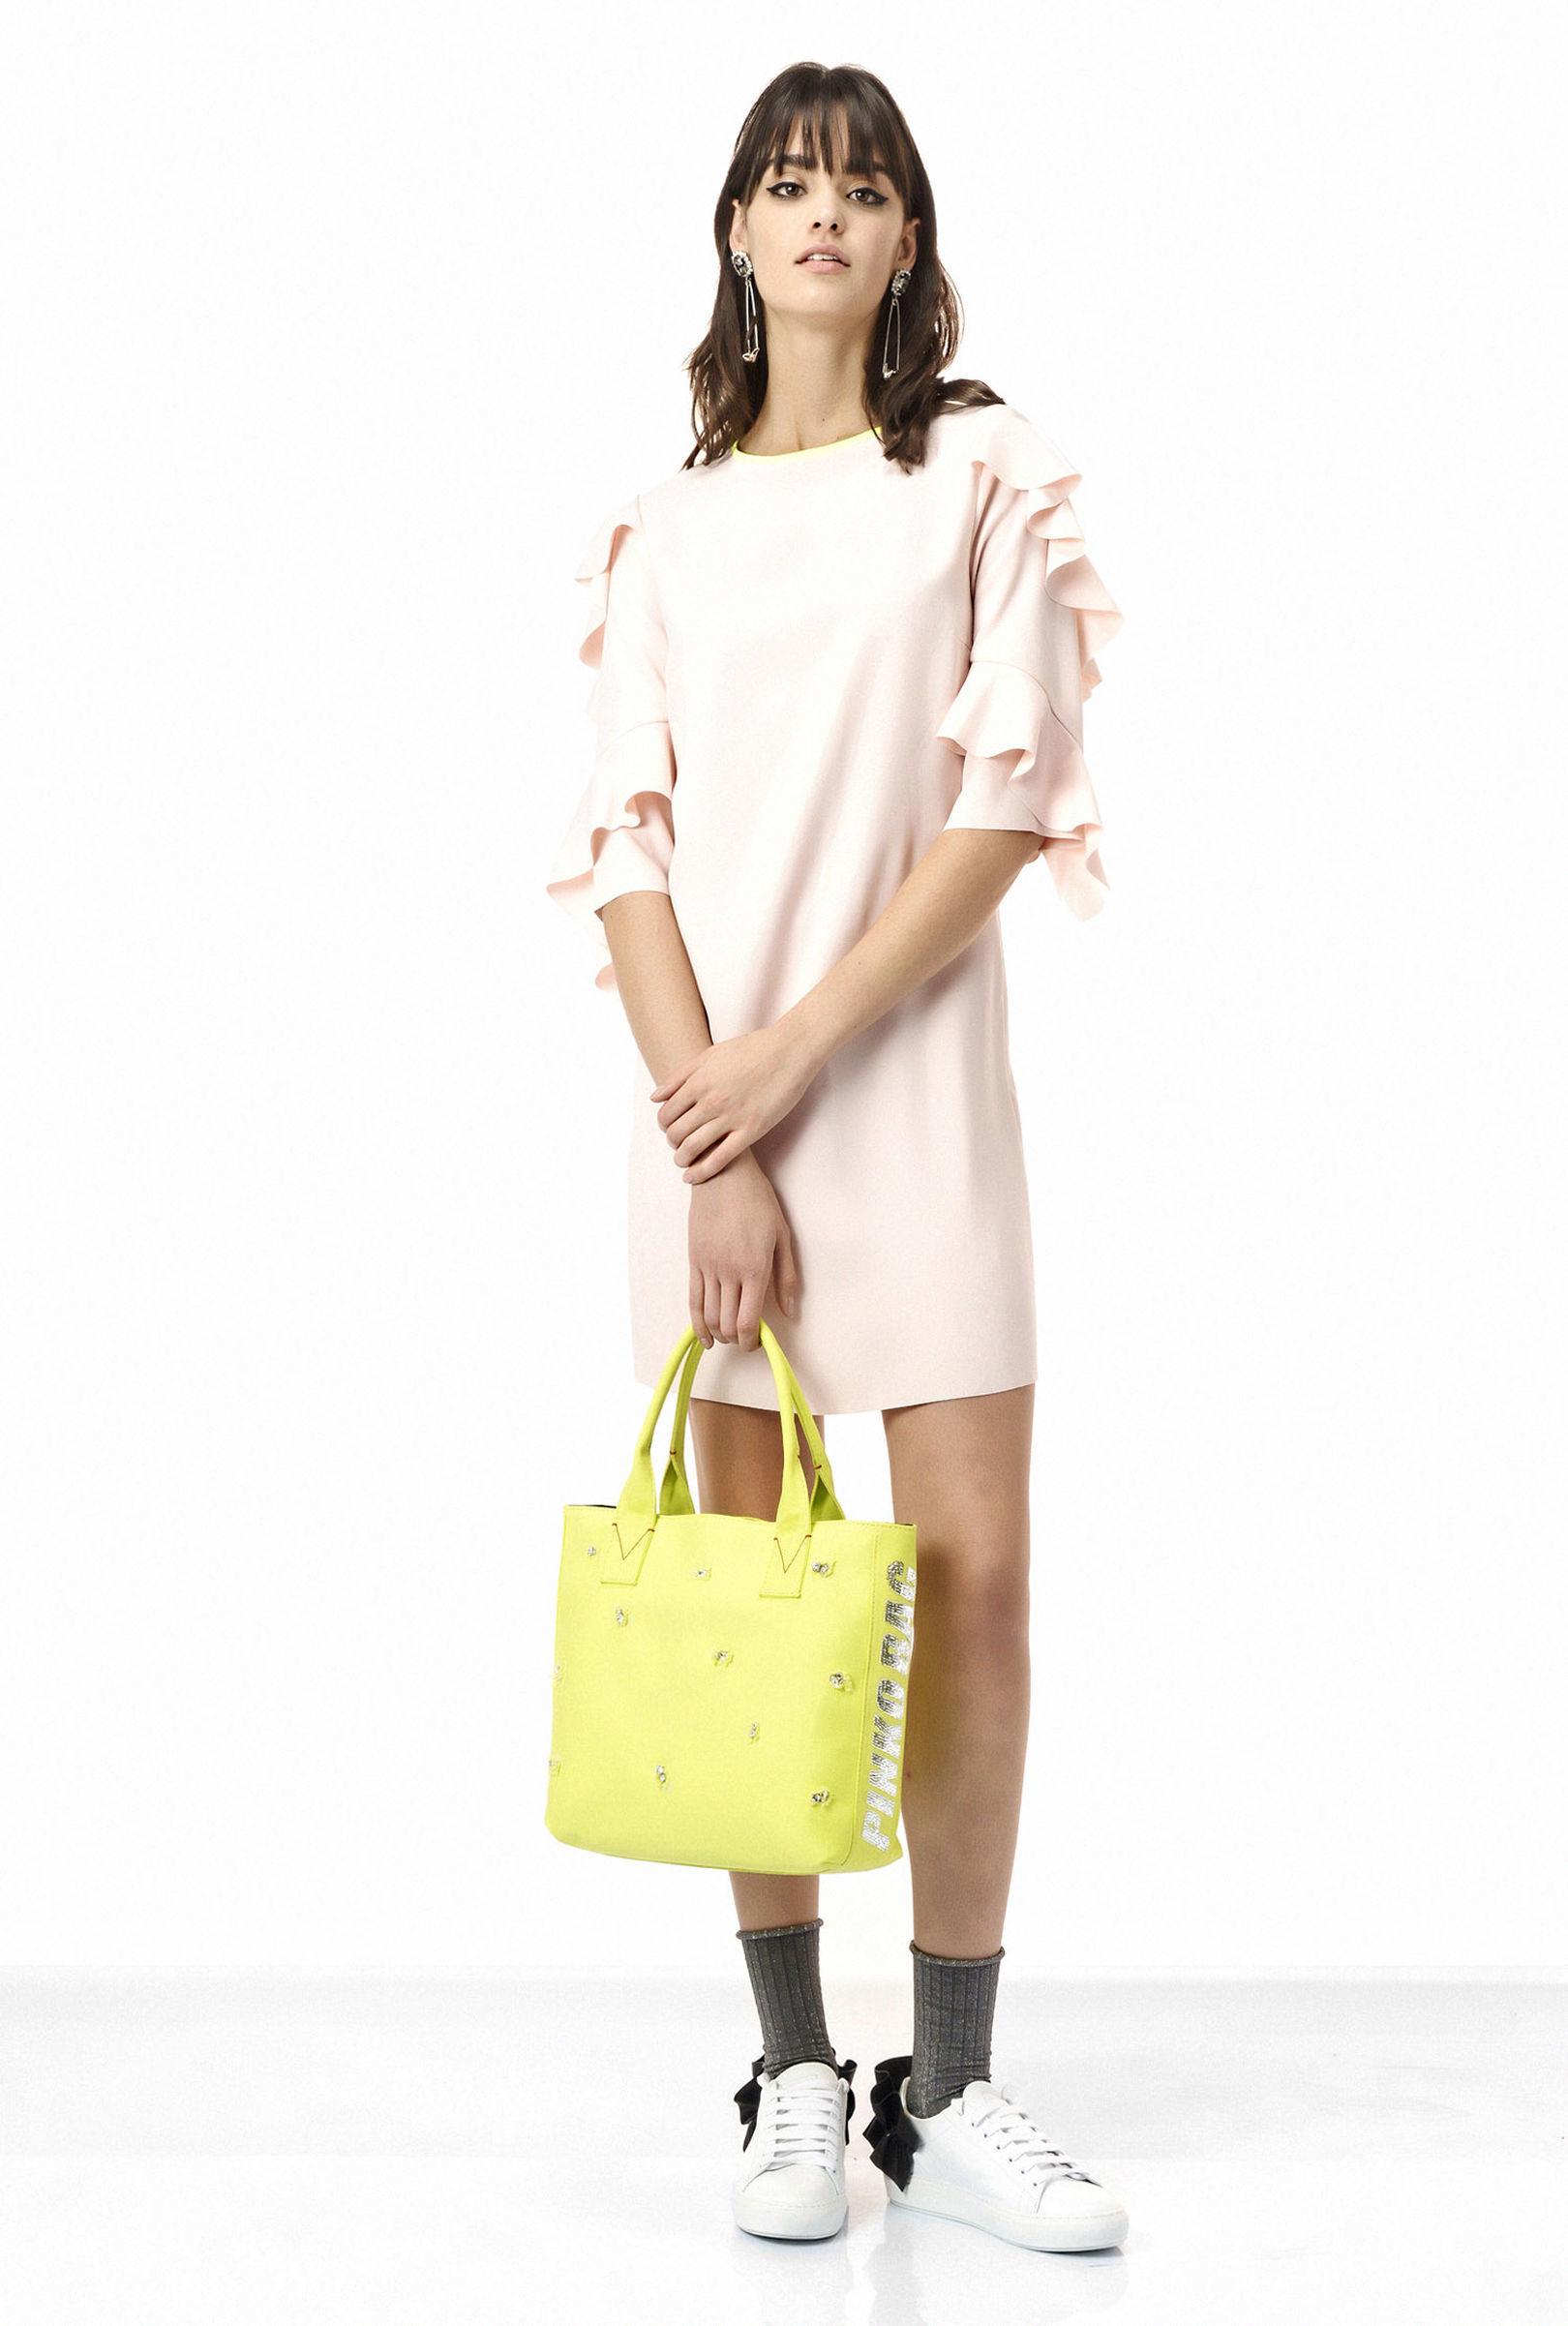 PINKO(ピンコ) frill dress 1G12XT-6352